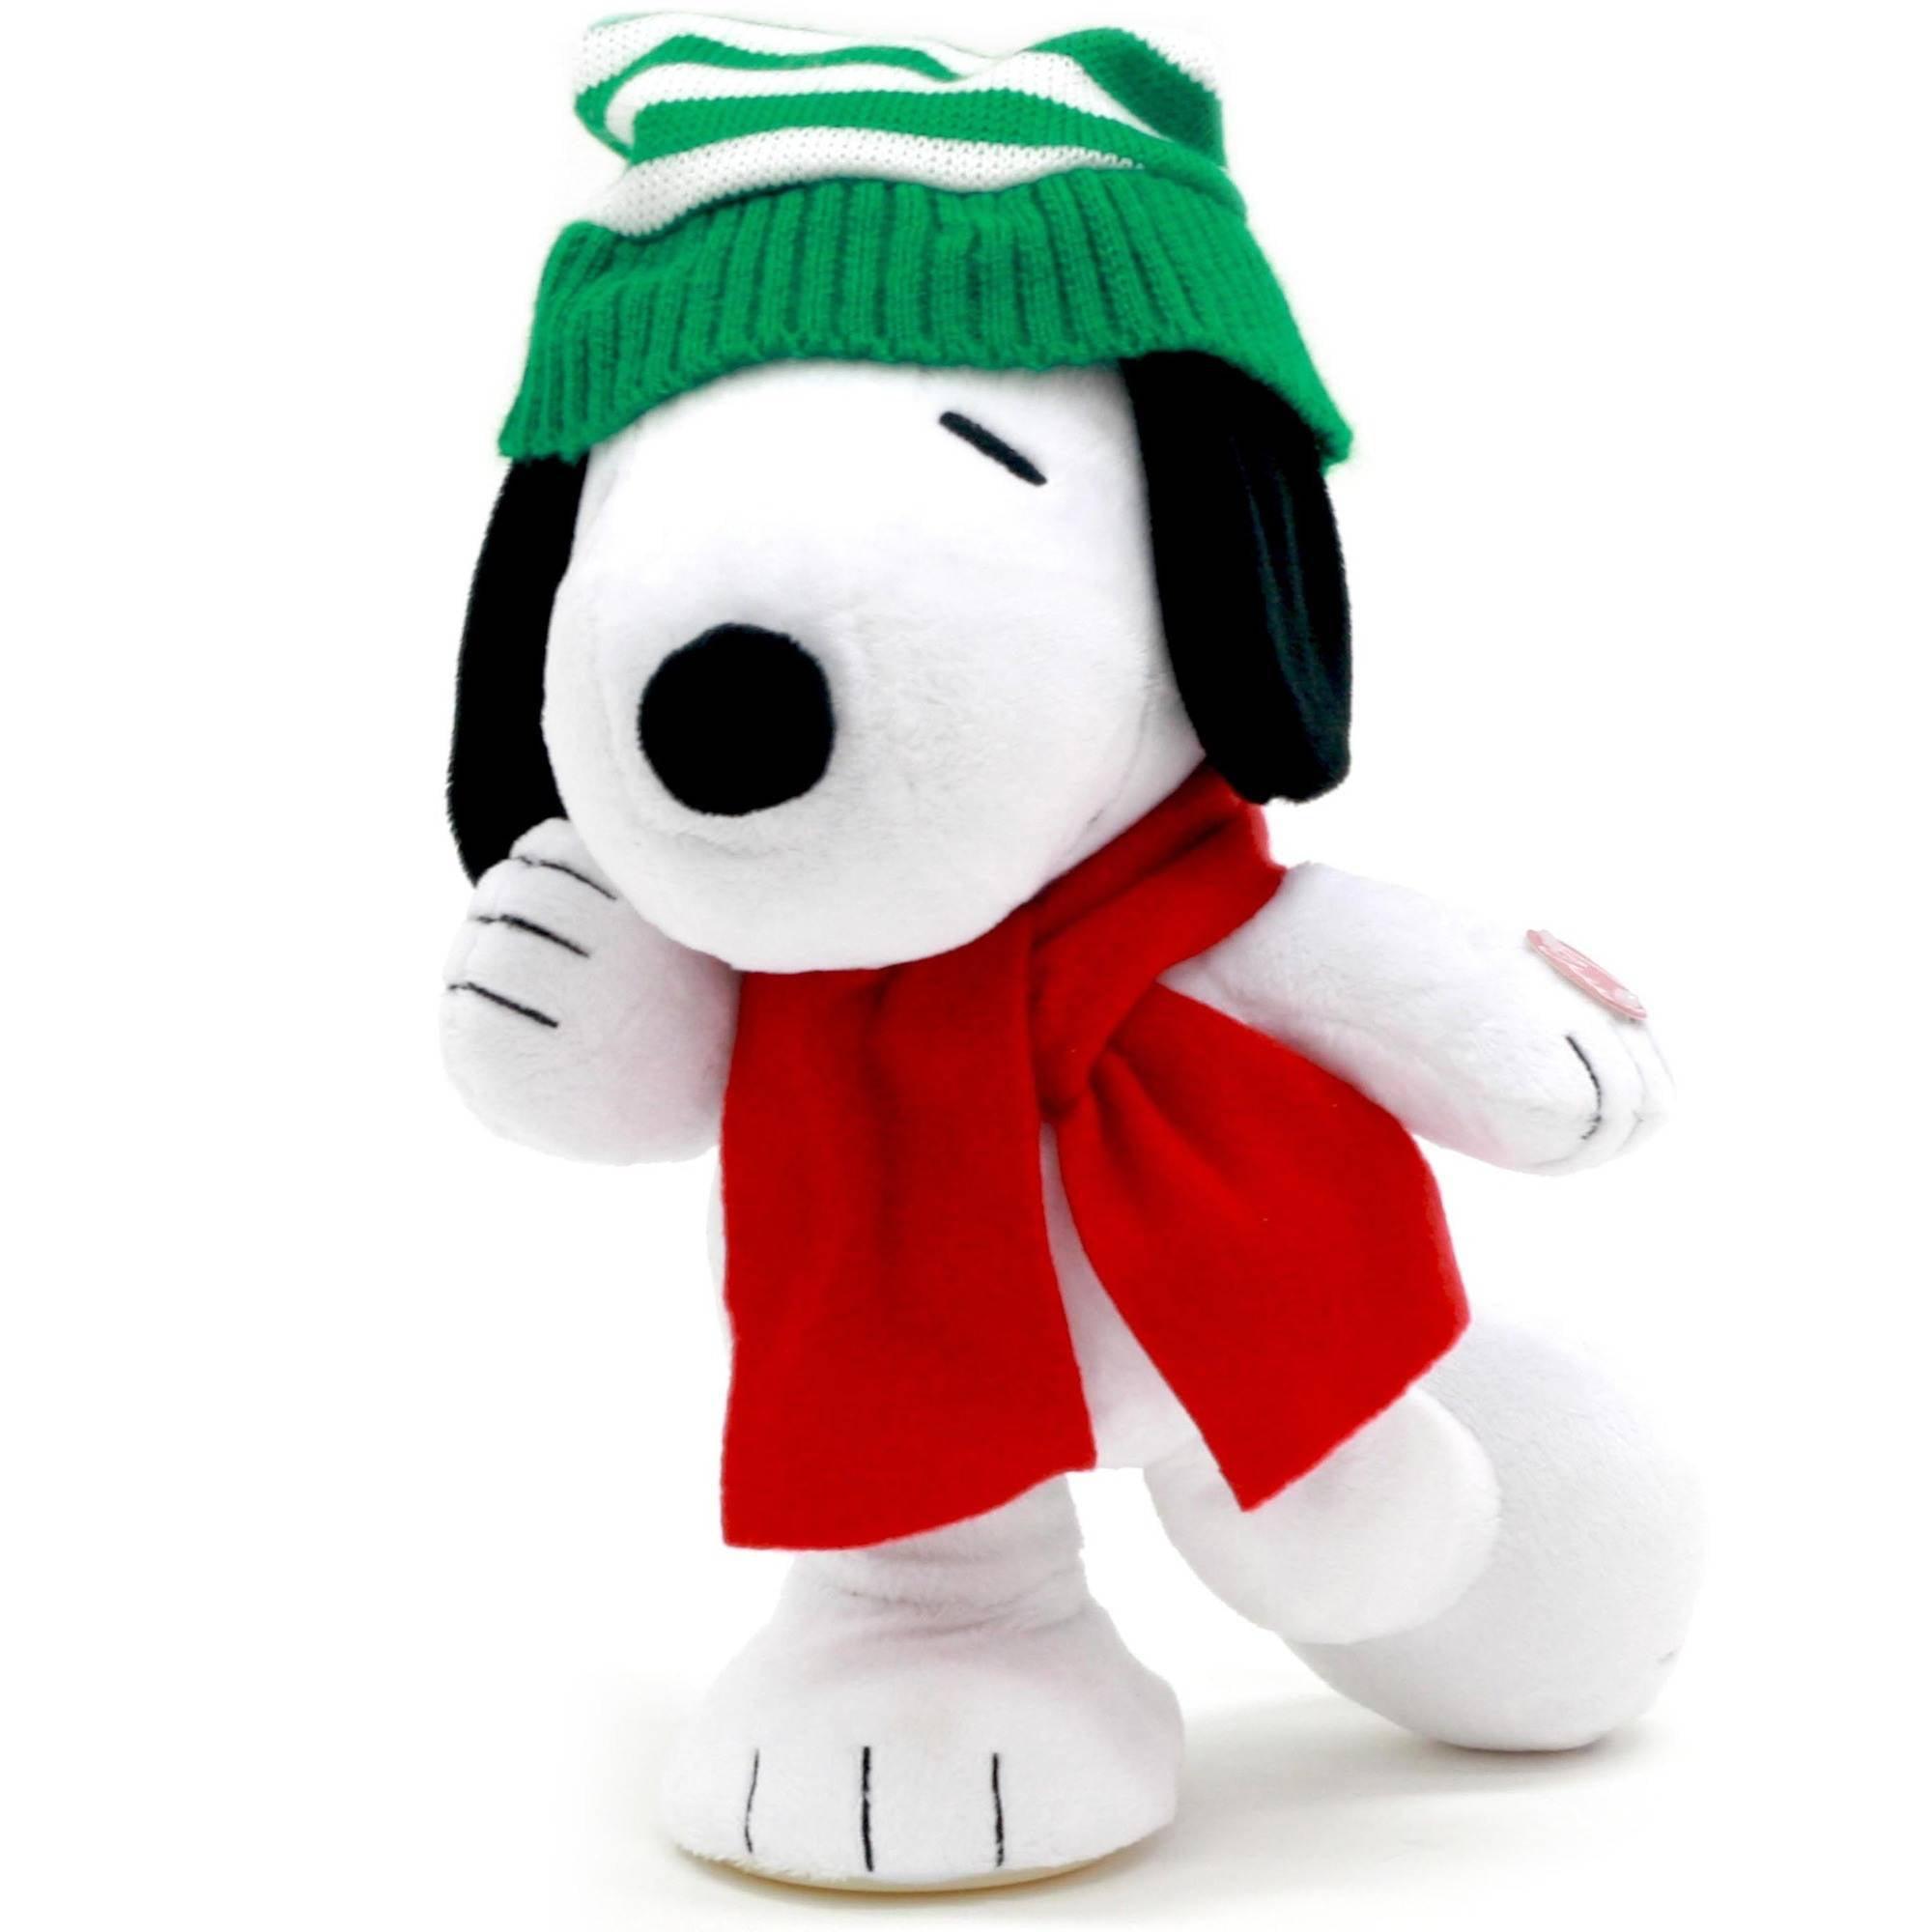 11.5-inch Musical Skating Peanuts Snoopy